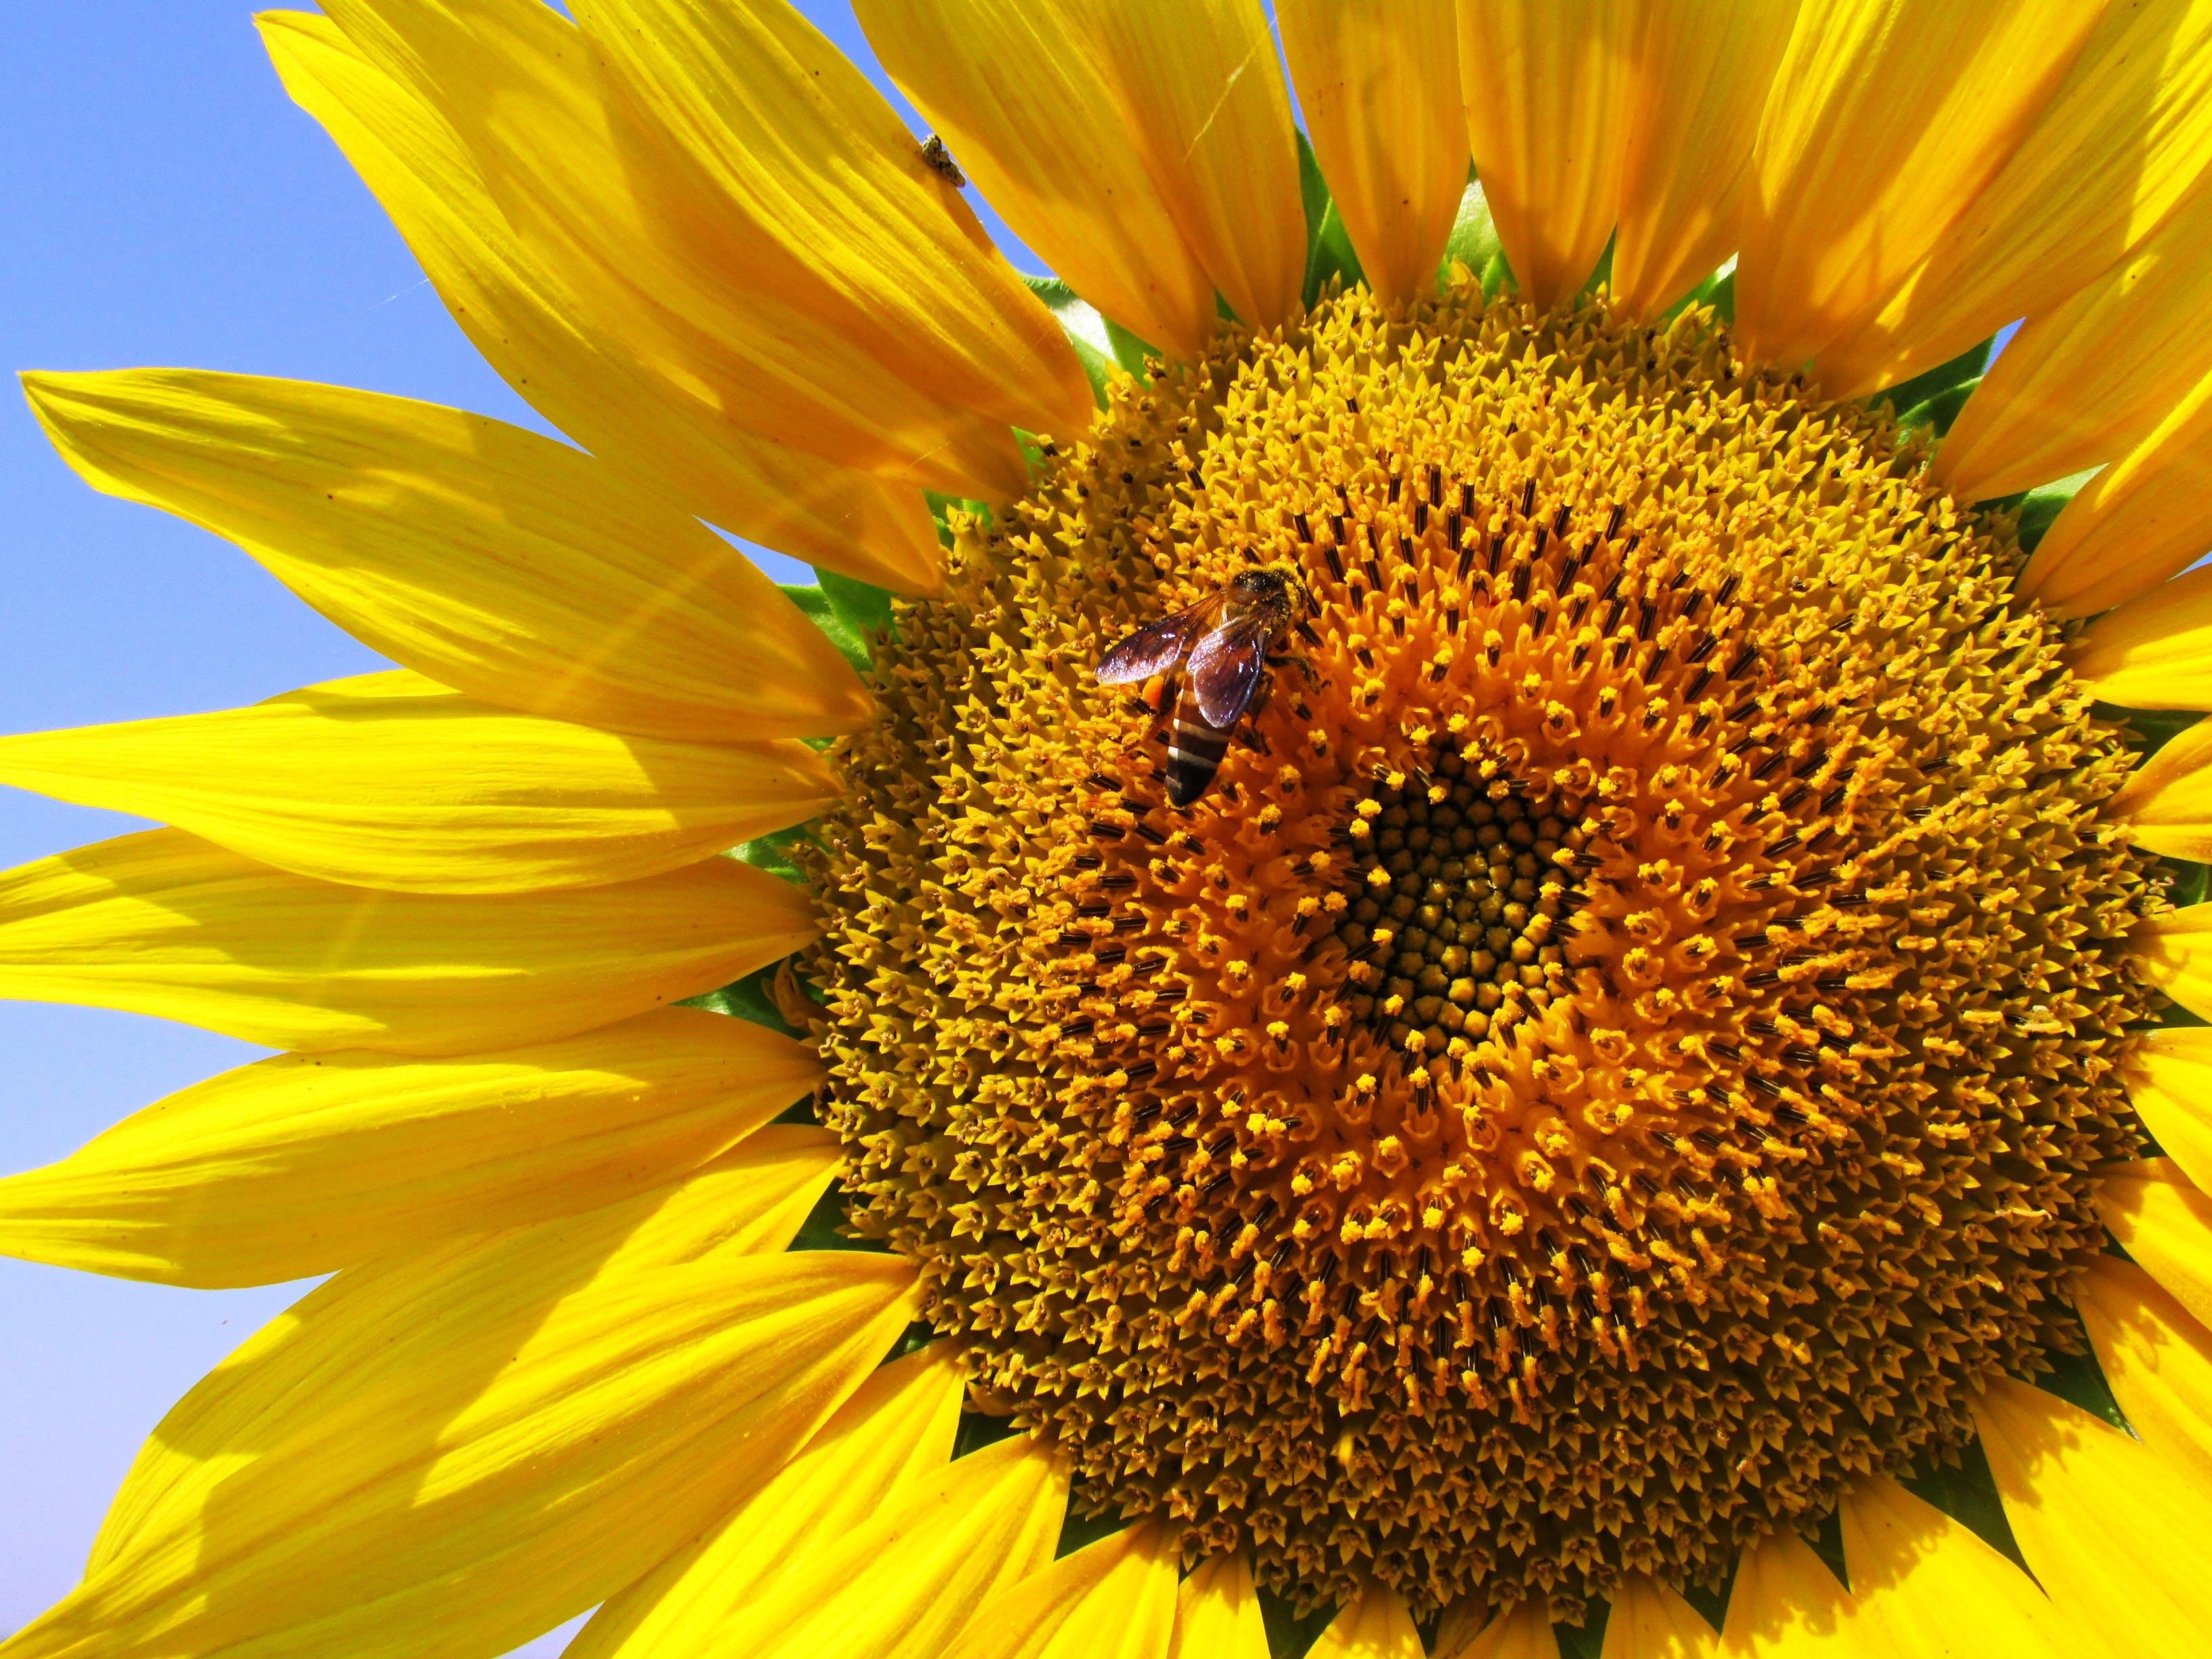 Honeybee on Sunflower during Daytime